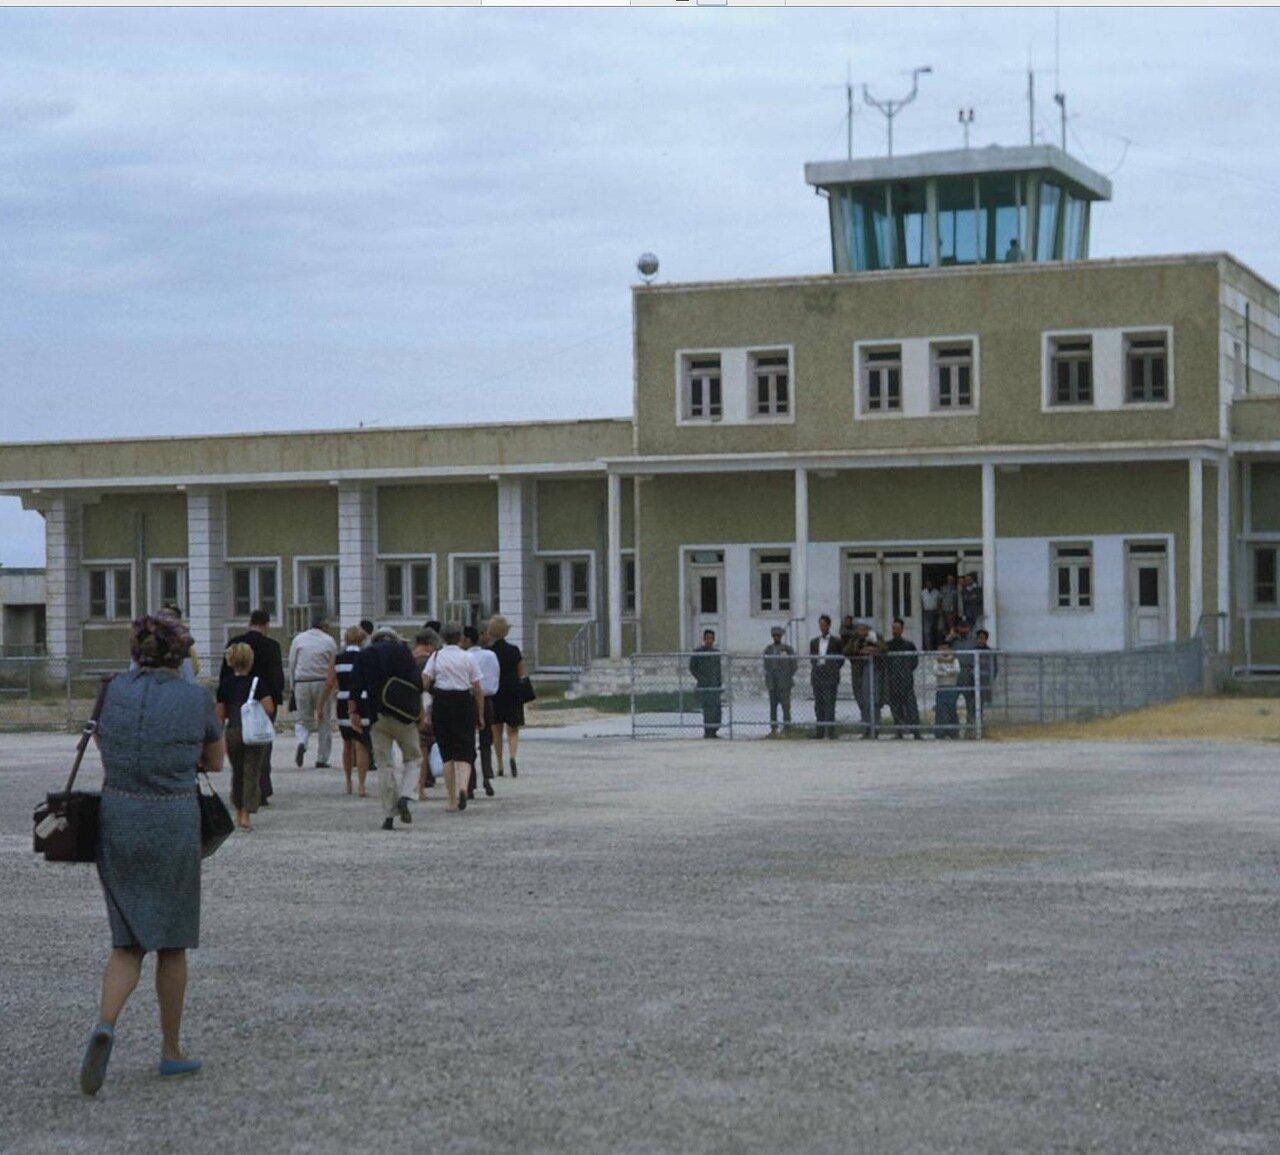 Мазари-Шариф. Аэропорт